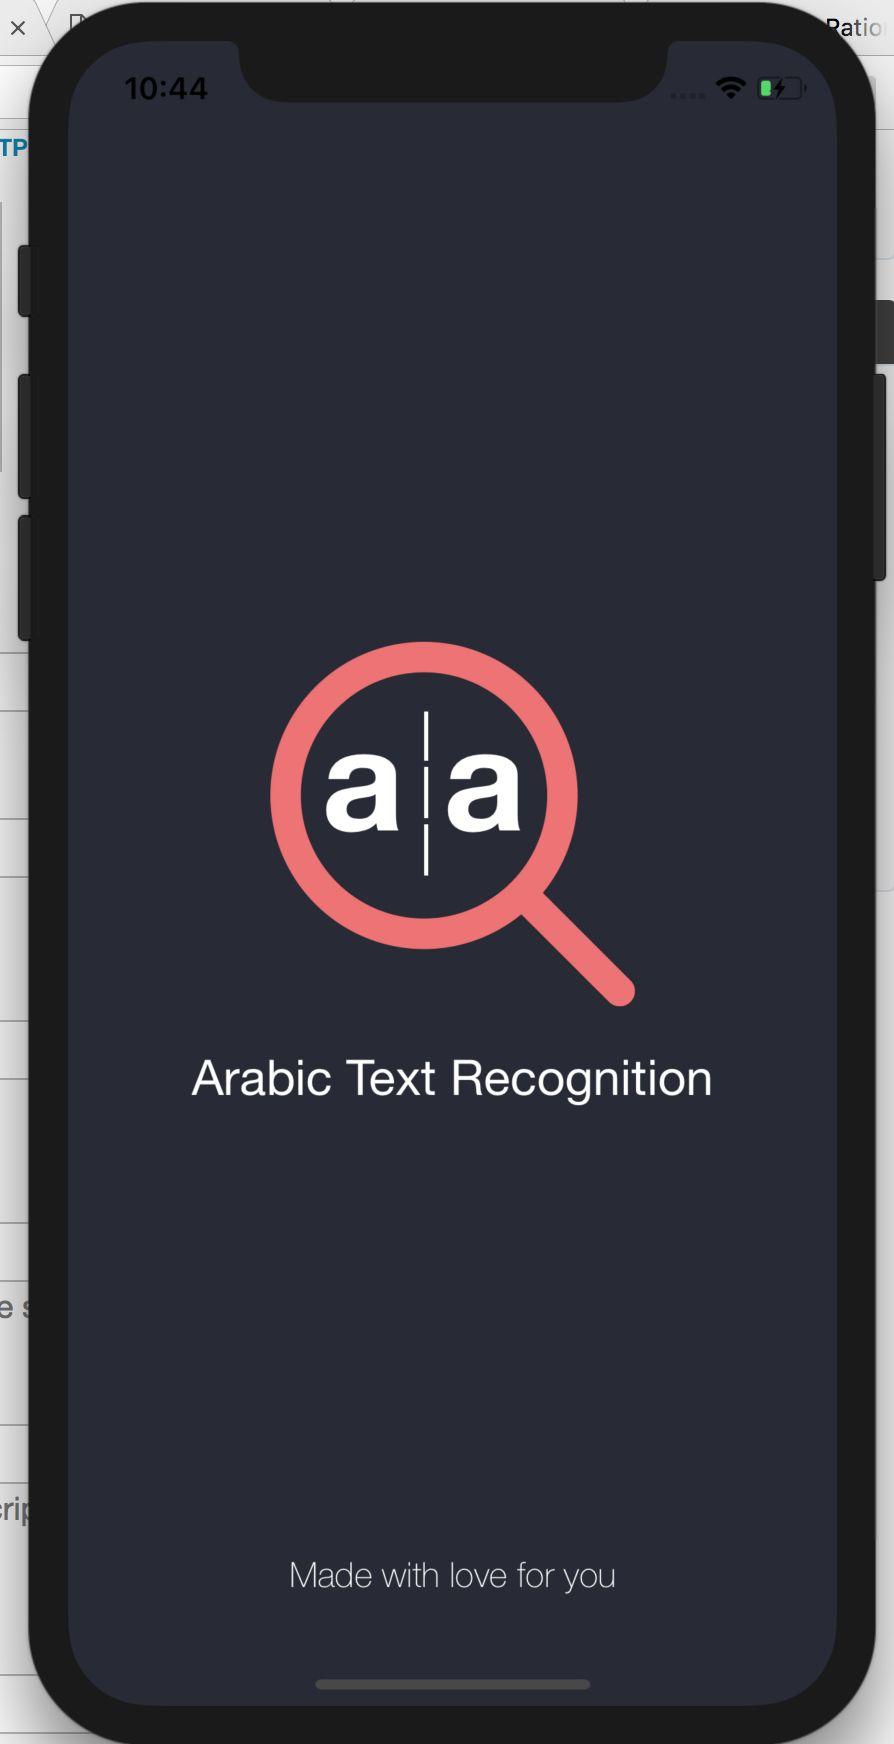 Arabic OCR Text Recognition Framework for iOS | Design